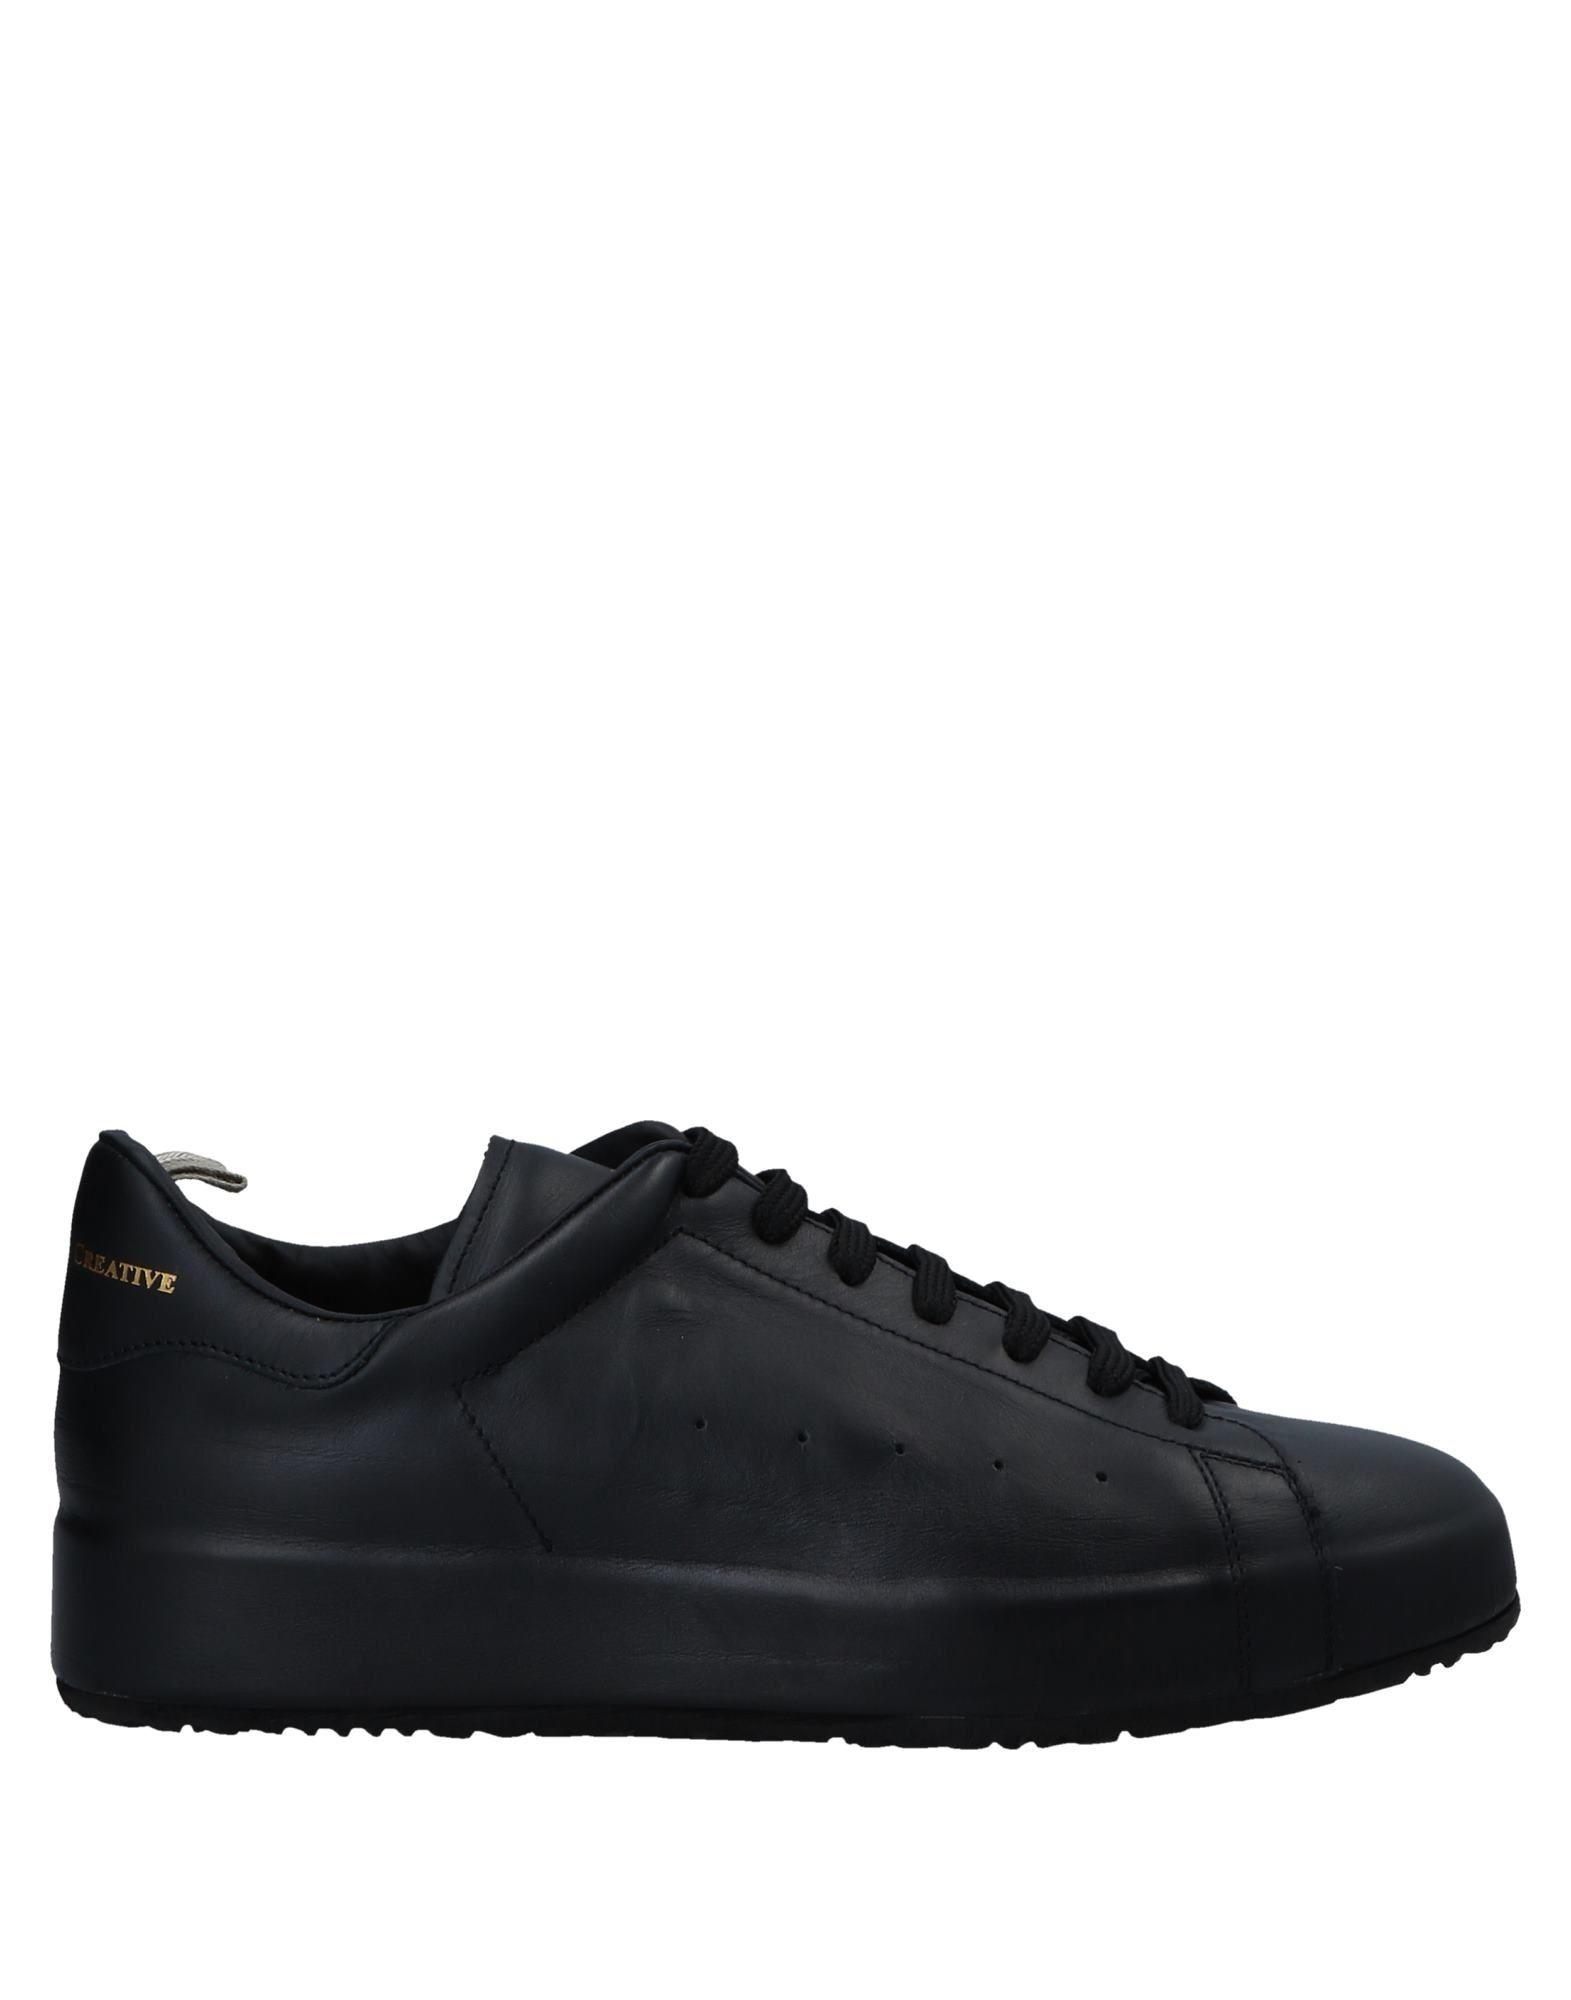 Officine Creative Officine Italia Sneakers - Men Officine Creative Creative Italia Sneakers online on  Canada - 11551284MM c5f86d